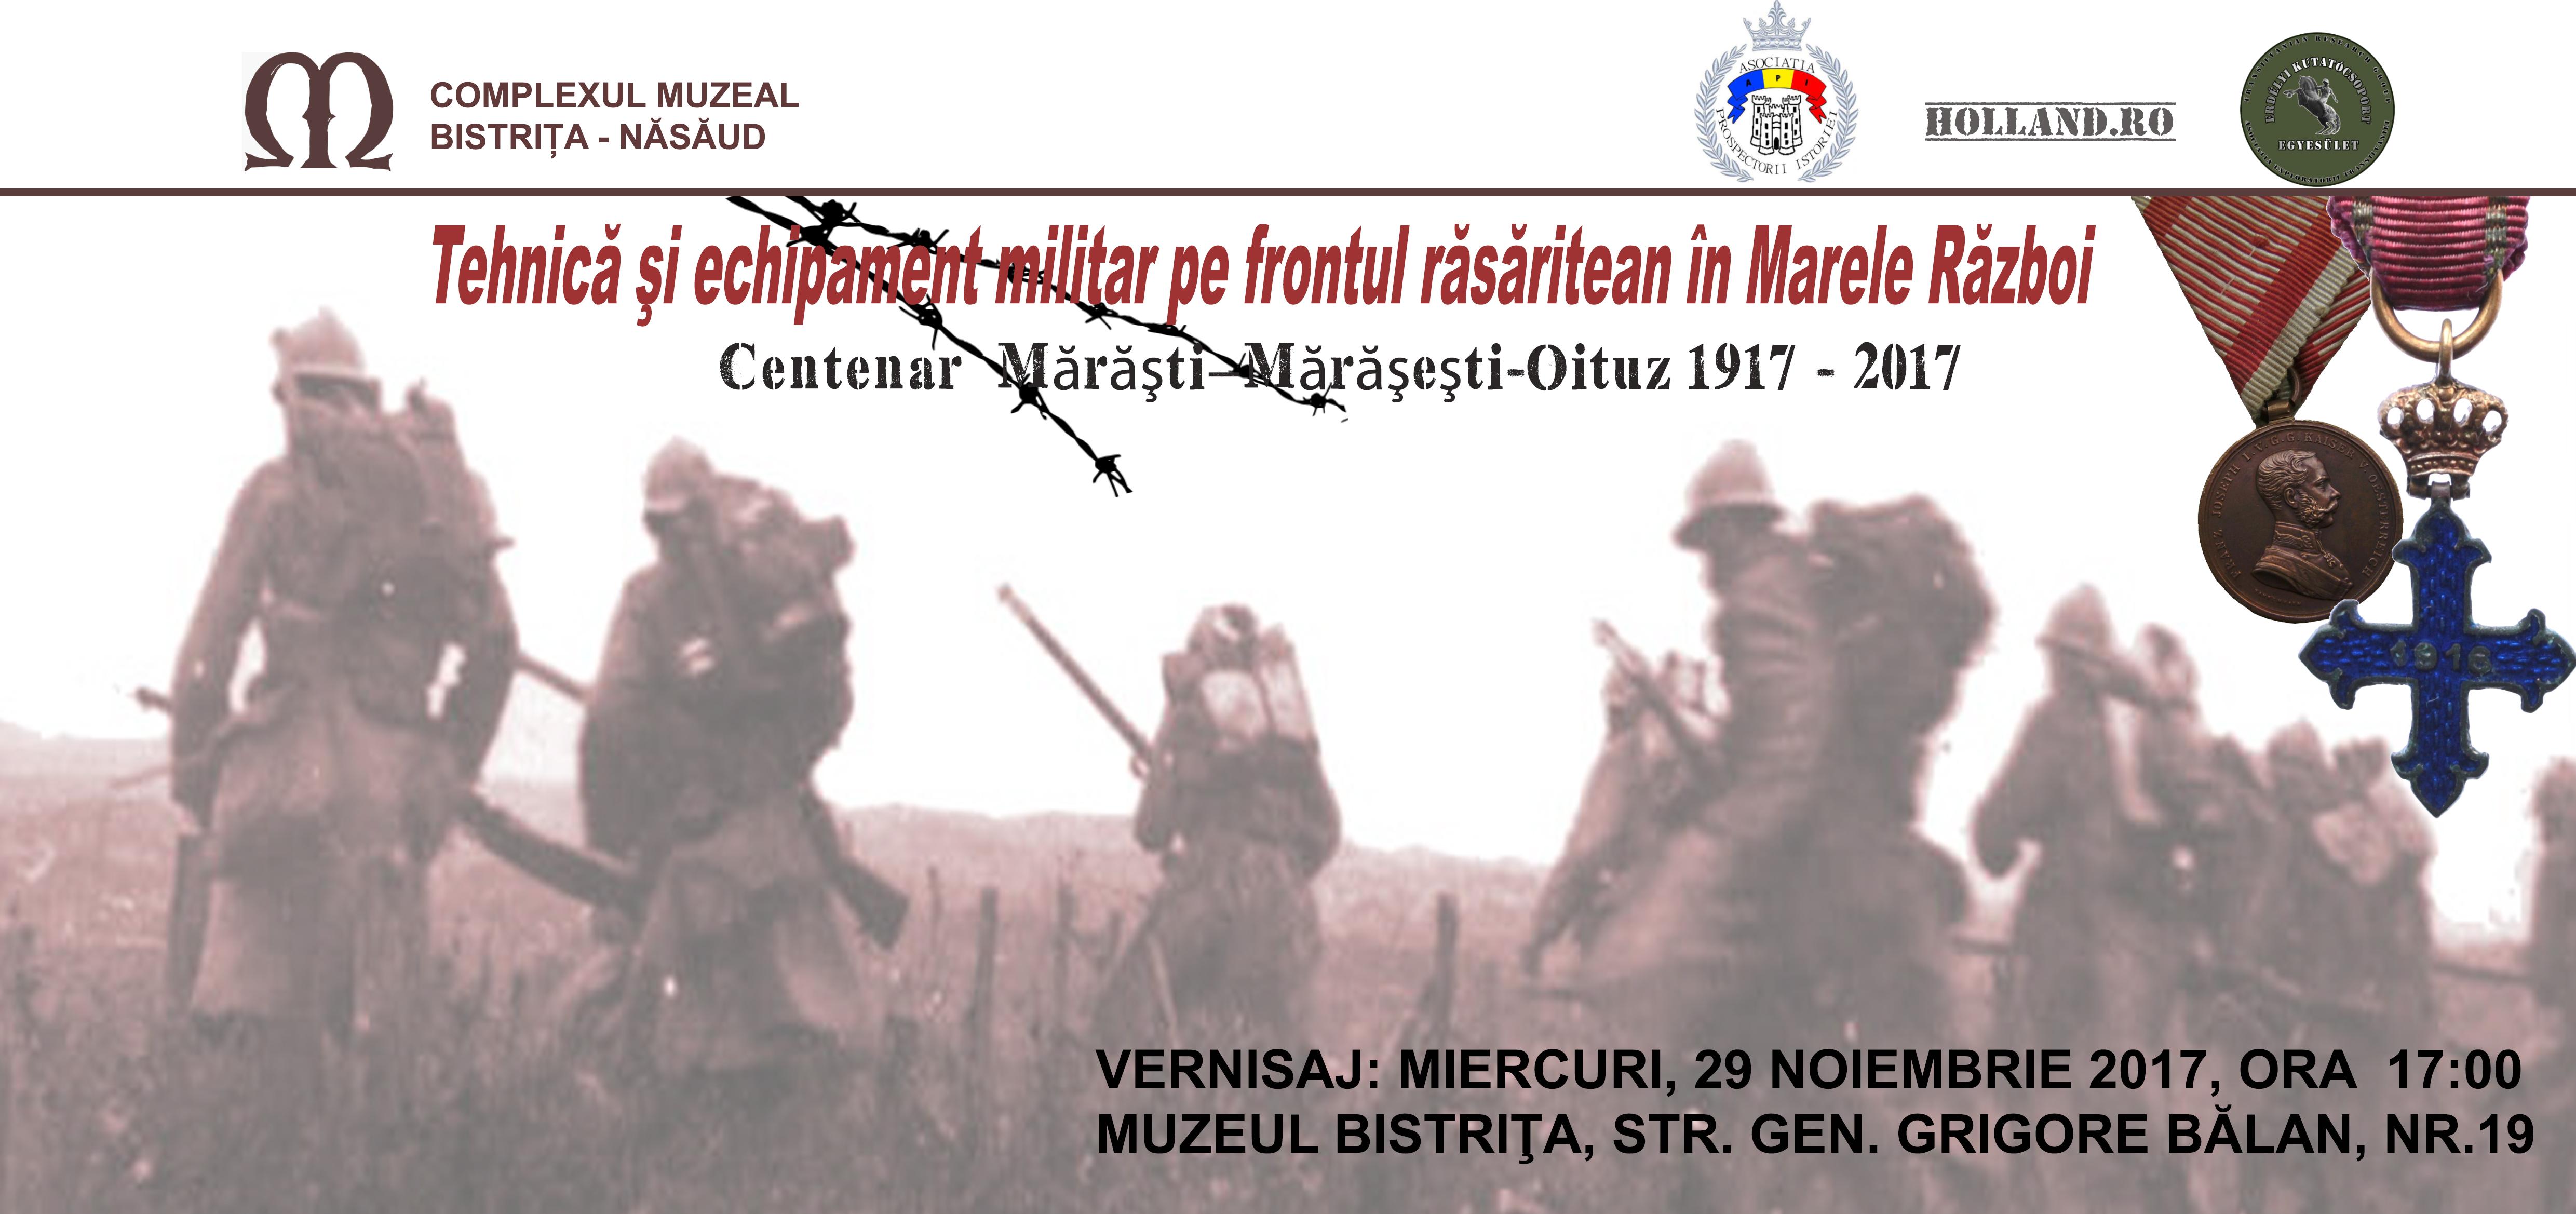 InvitatieOK Vernisaj Complexul Muzeal Bistrita-Nasaud  29.11.2017 Centernar ww1